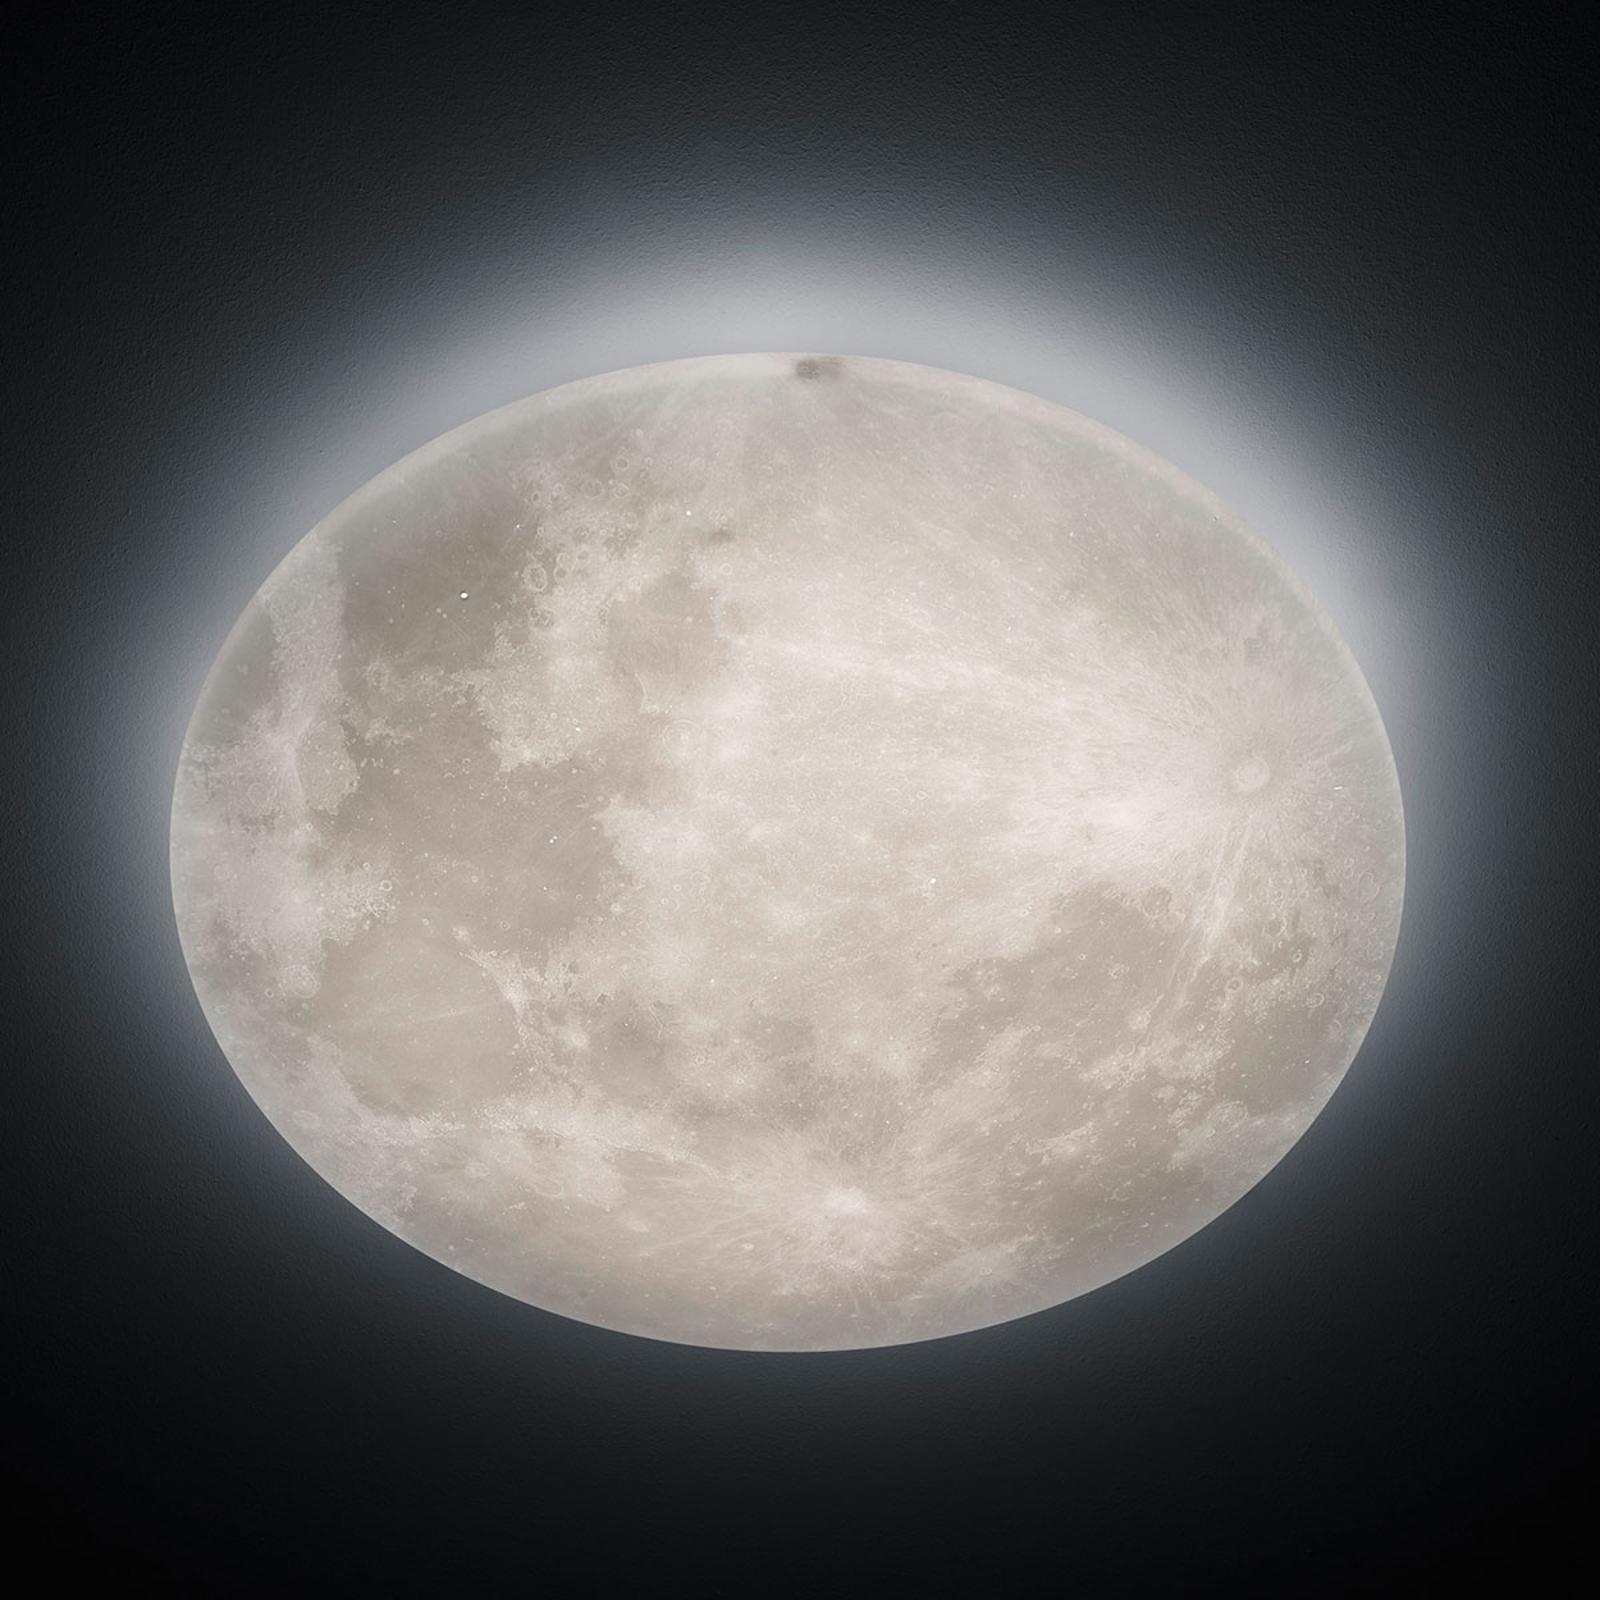 LED-loftlampe Lunar med fjernbetjening 60cm